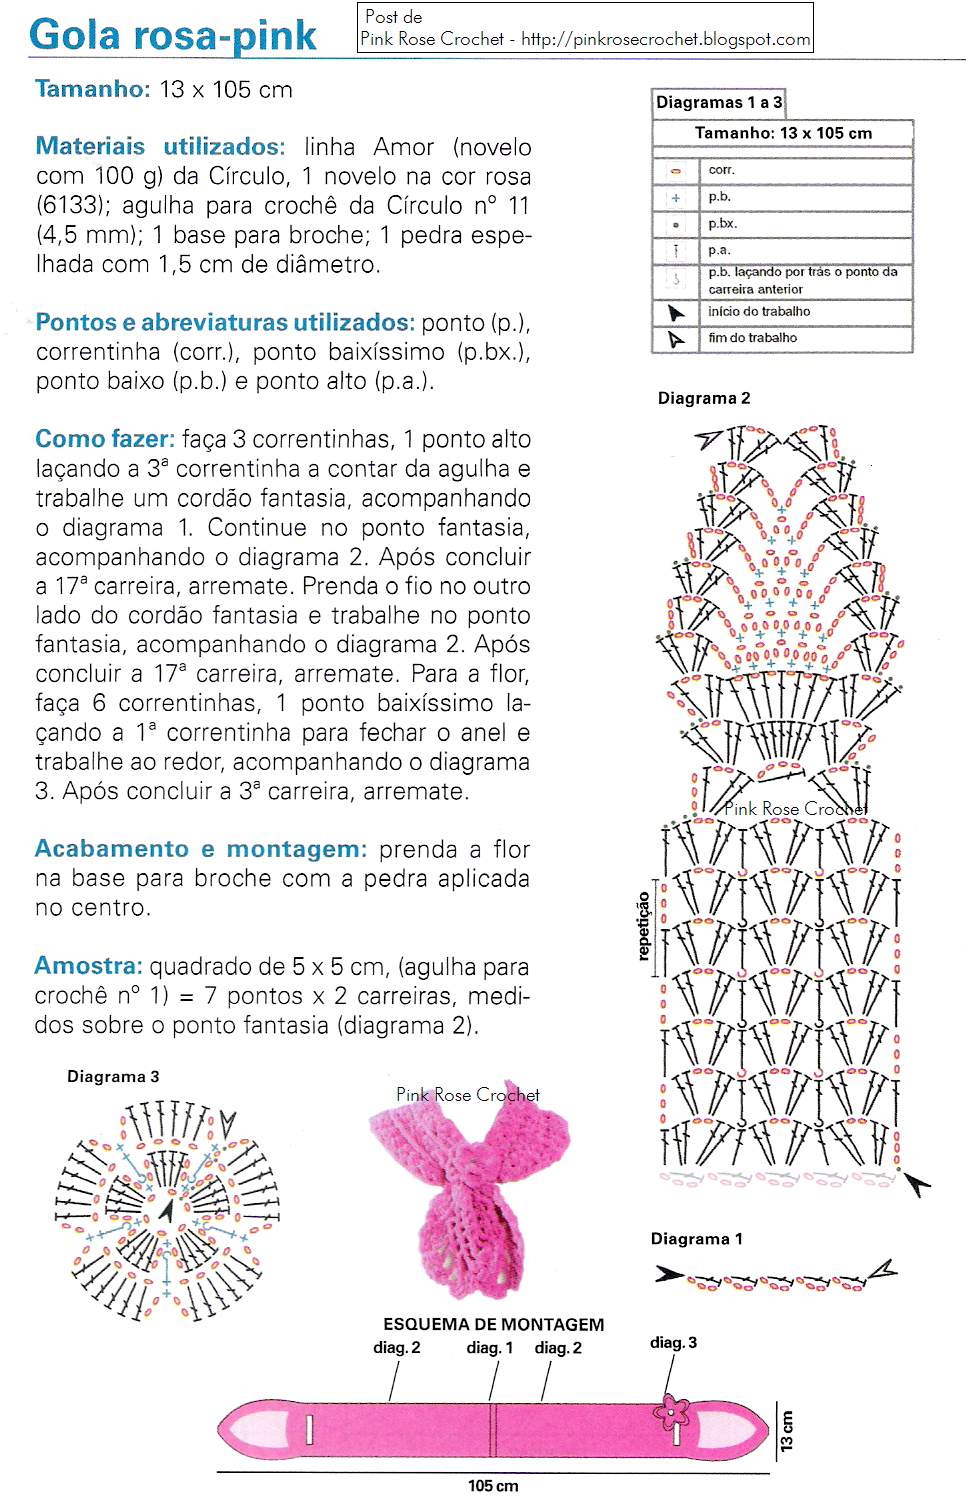 Ажурные шарфы крючком схемы 40